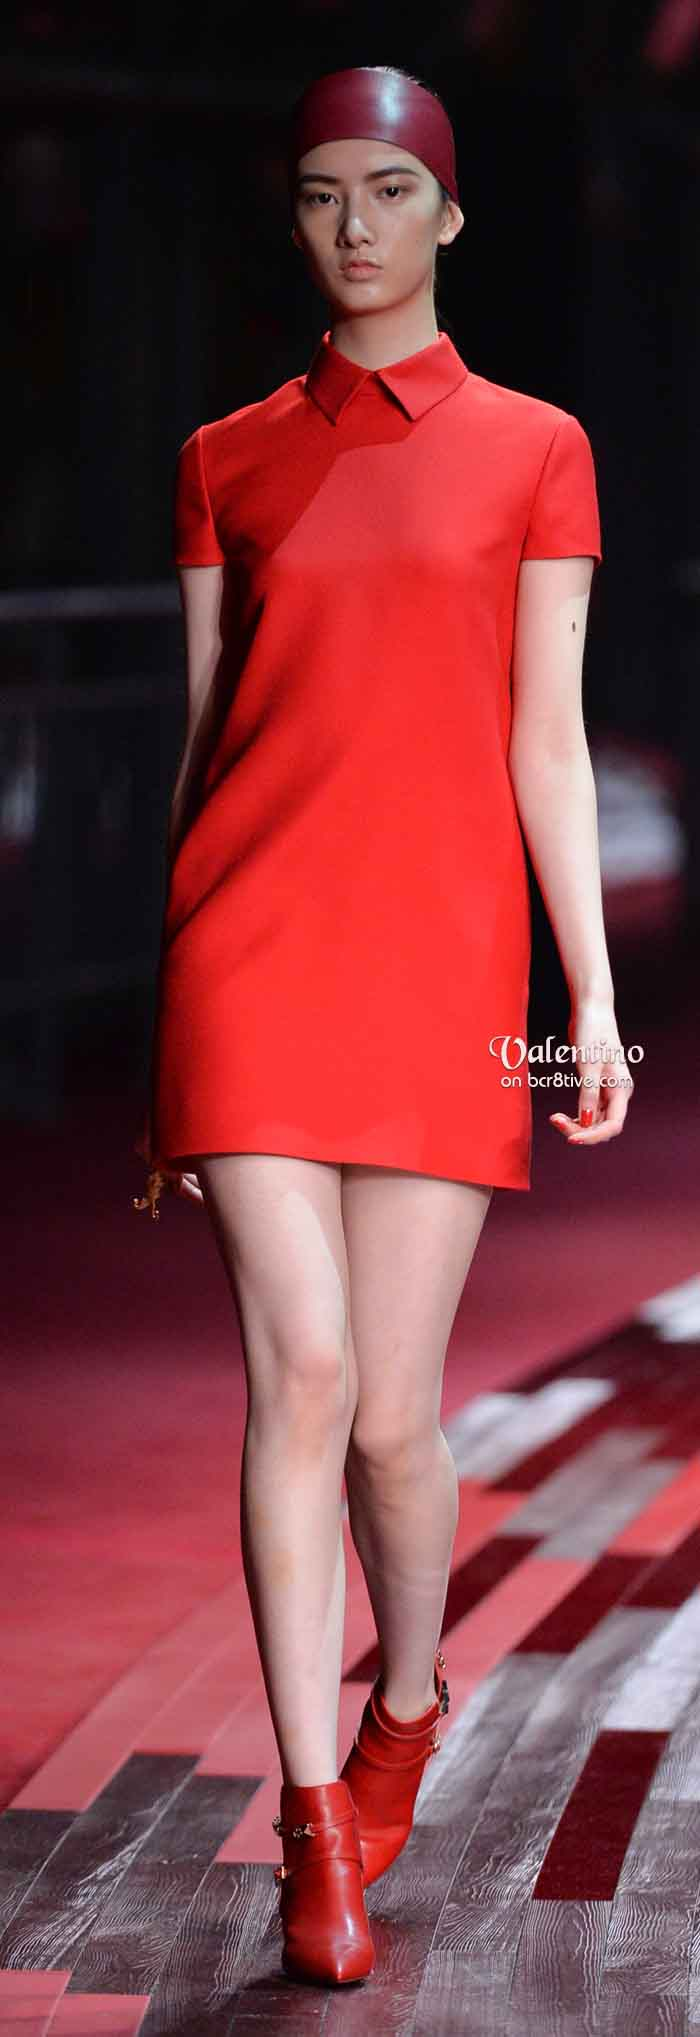 Valentino Shanghai 2013